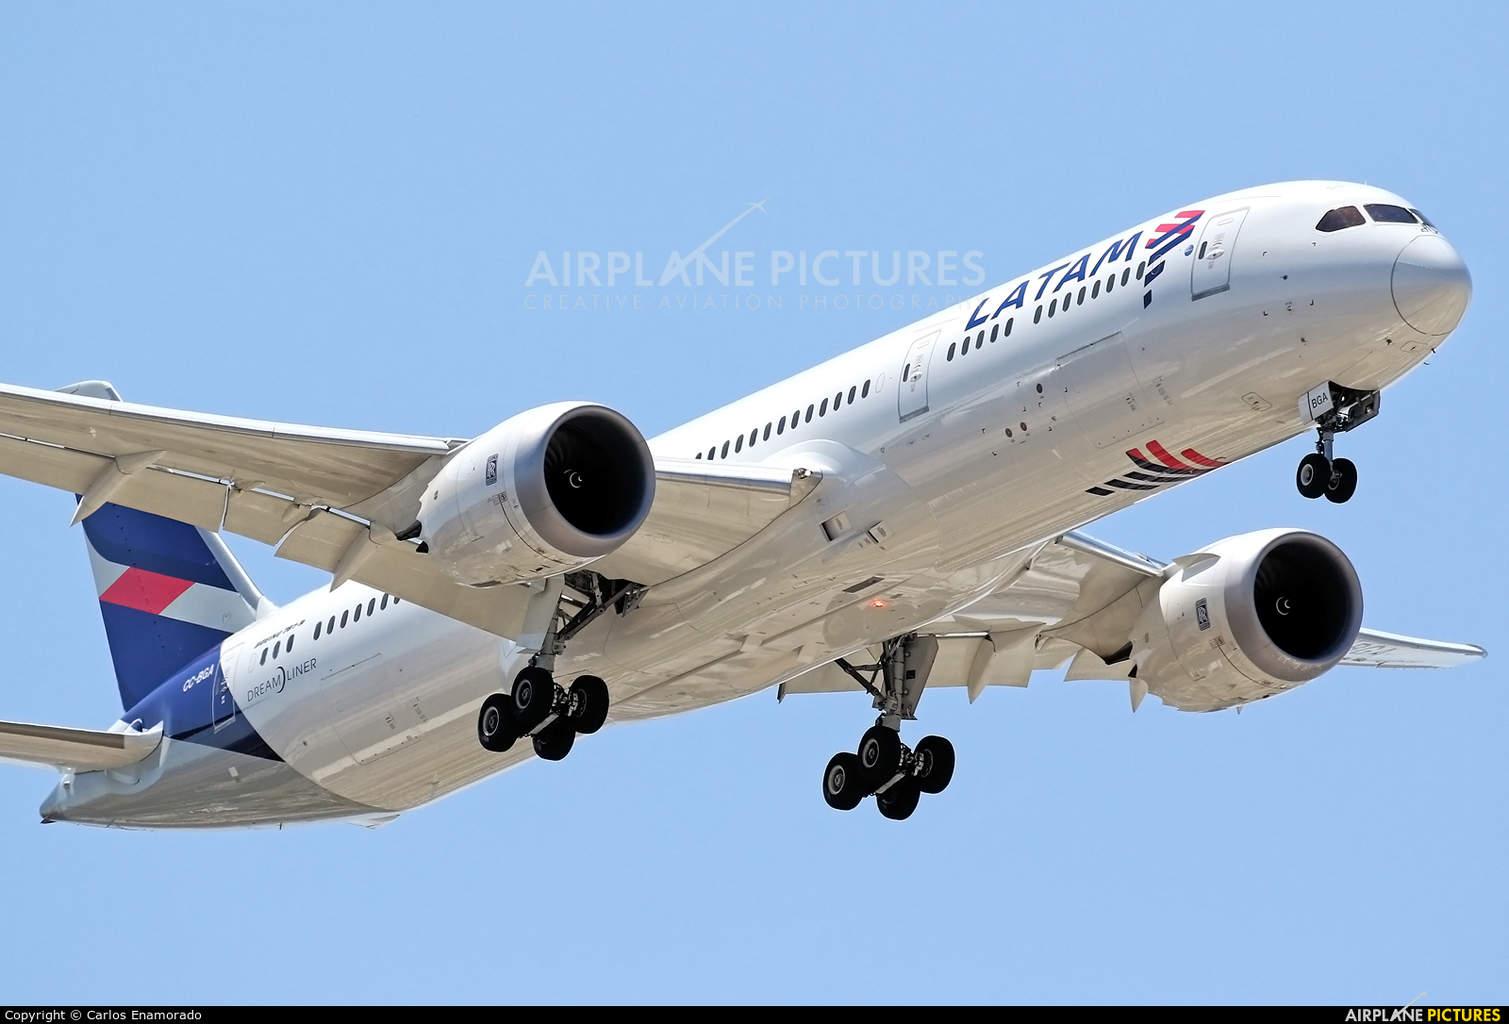 Qatar Airways to purchase 10% of LATAM